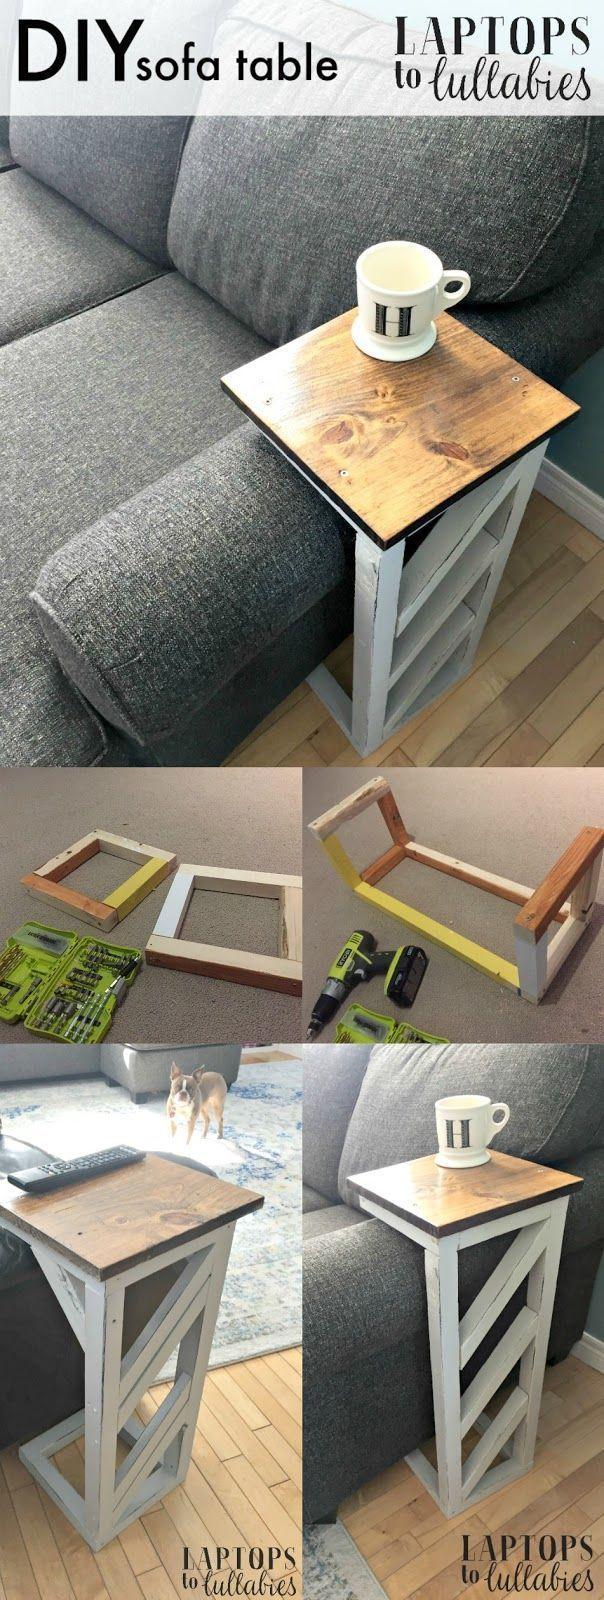 Laptops to Lullabies: Easy DIY sofa tables